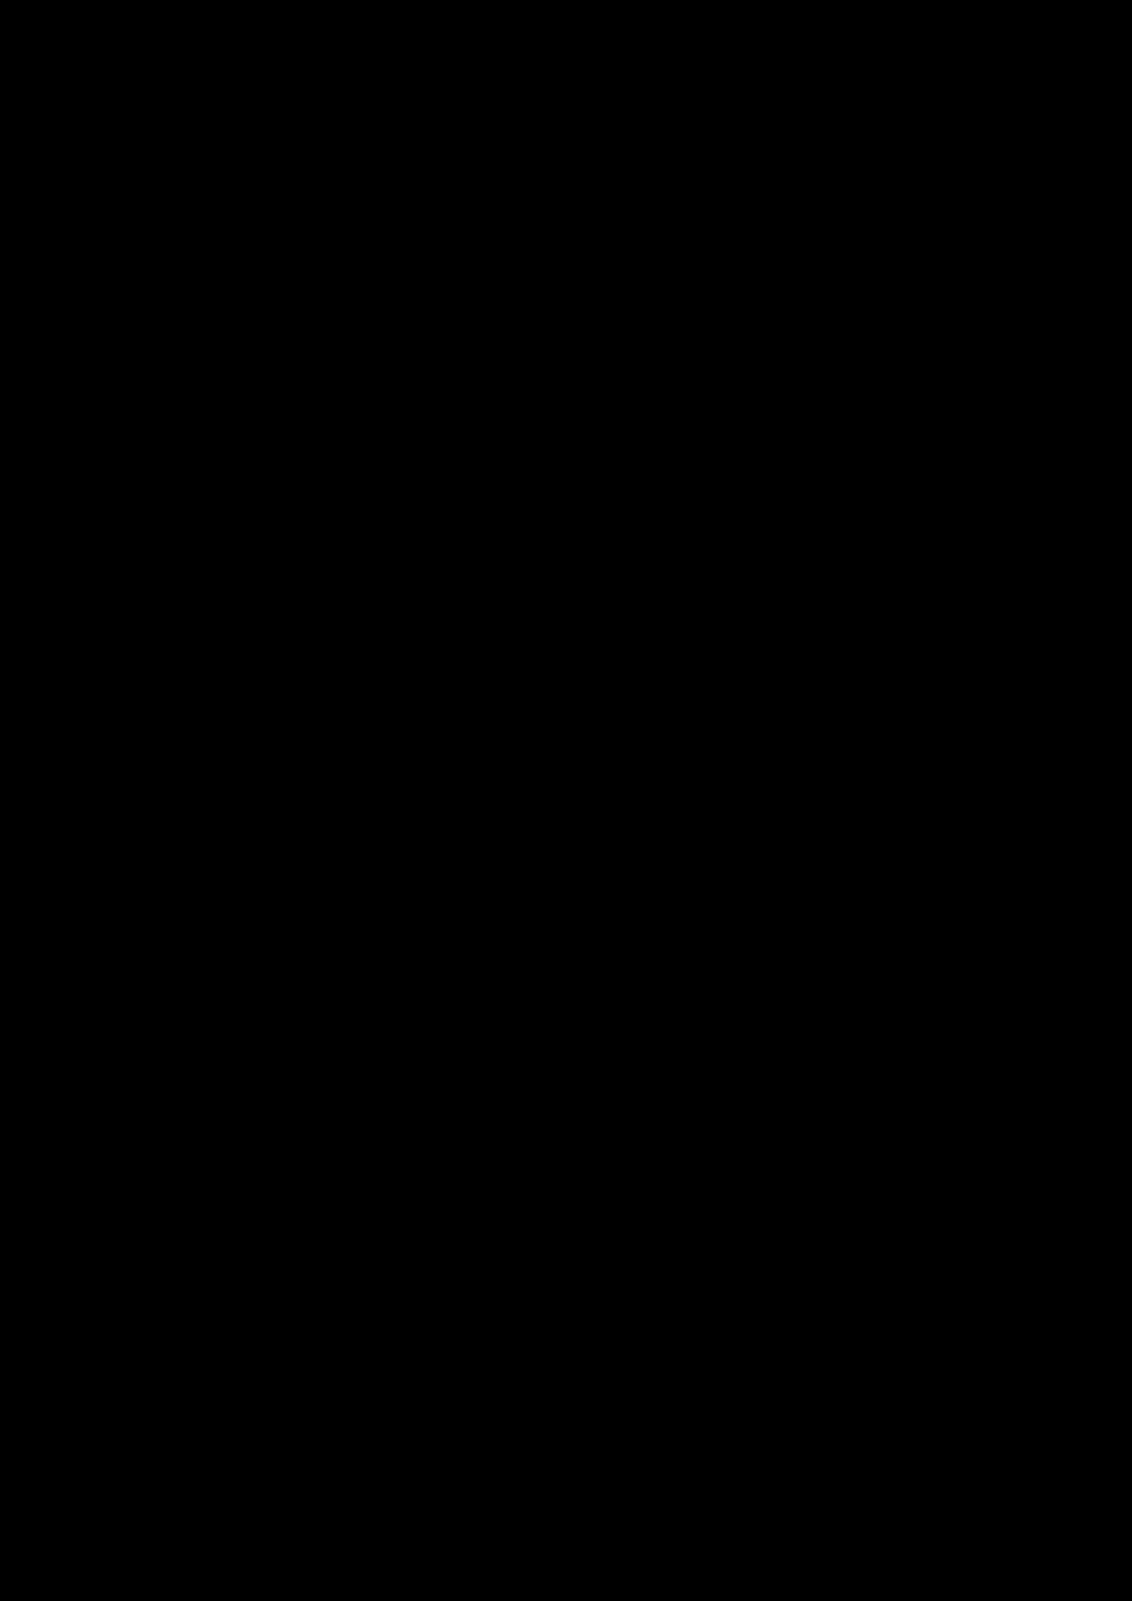 Belyiy sokol slide, Image 182